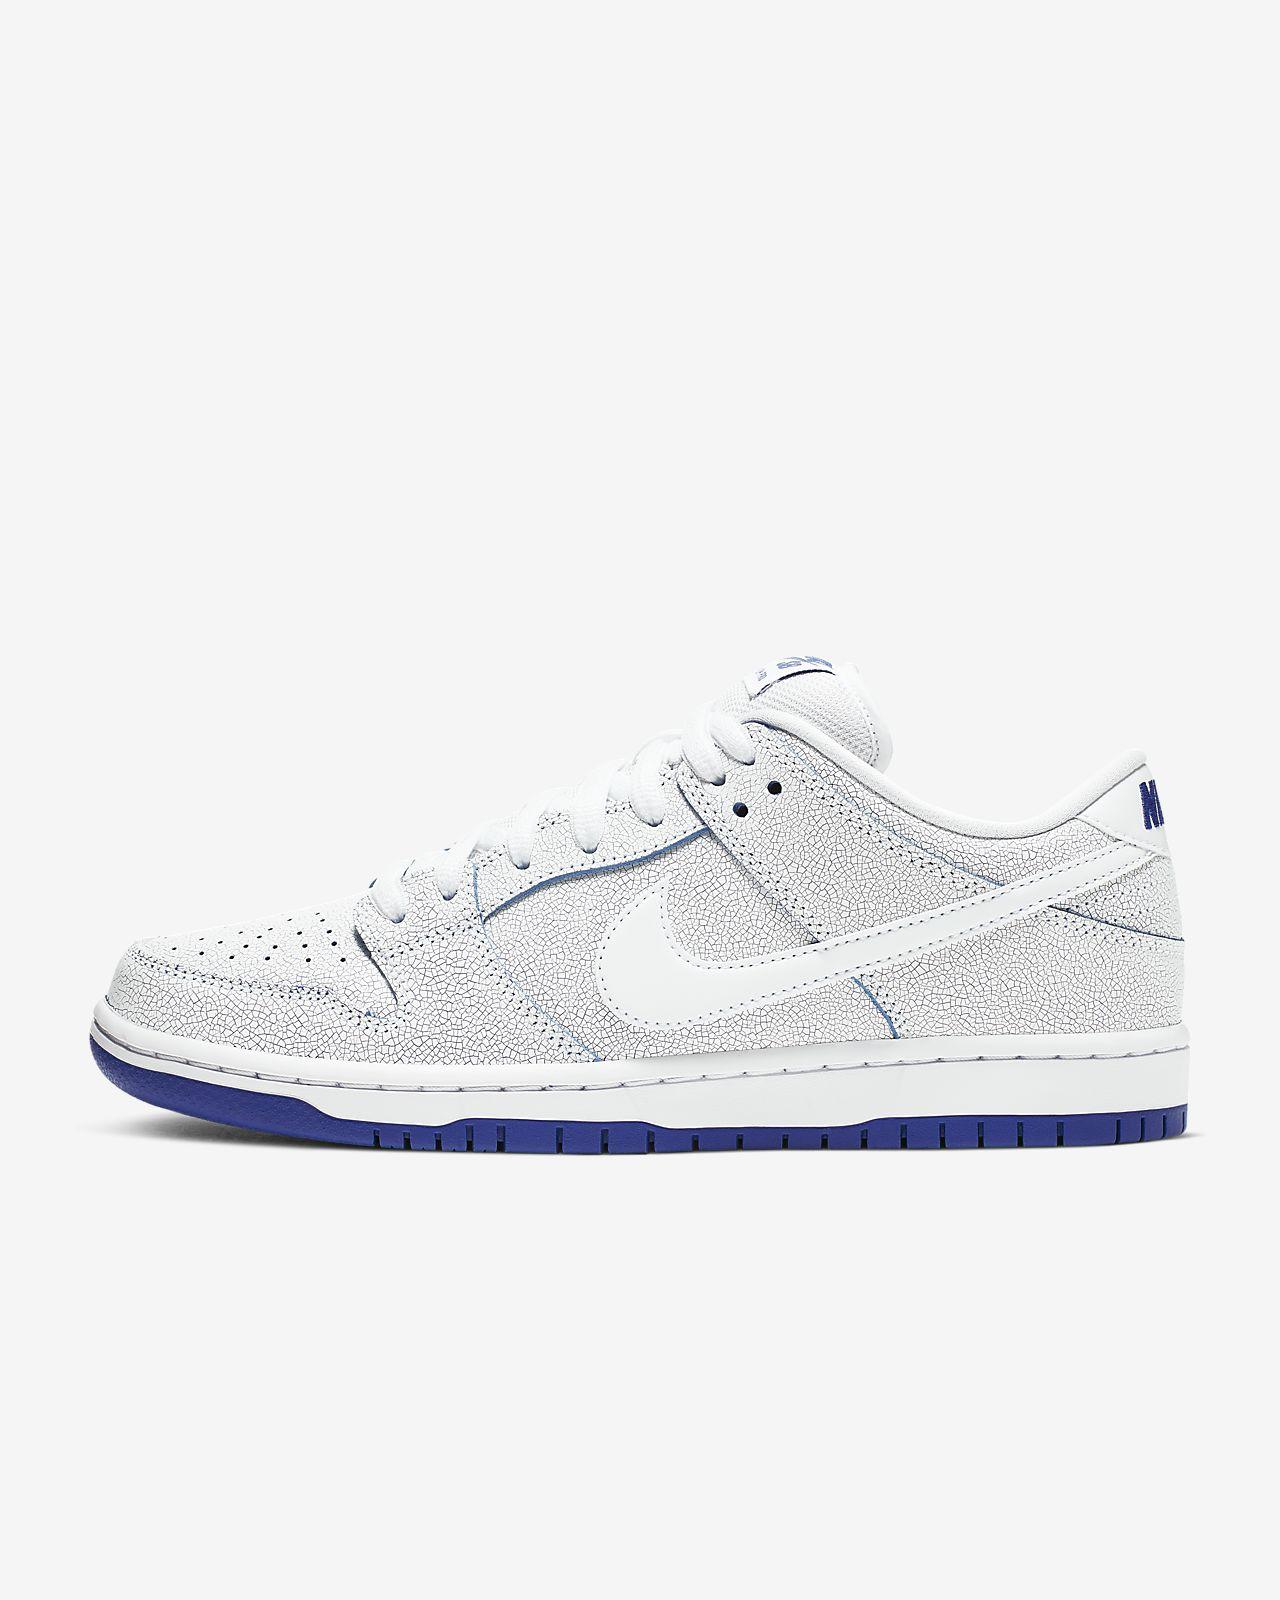 Nike SB Dunk Low Pro Premium Kaykay Ayakkabısı